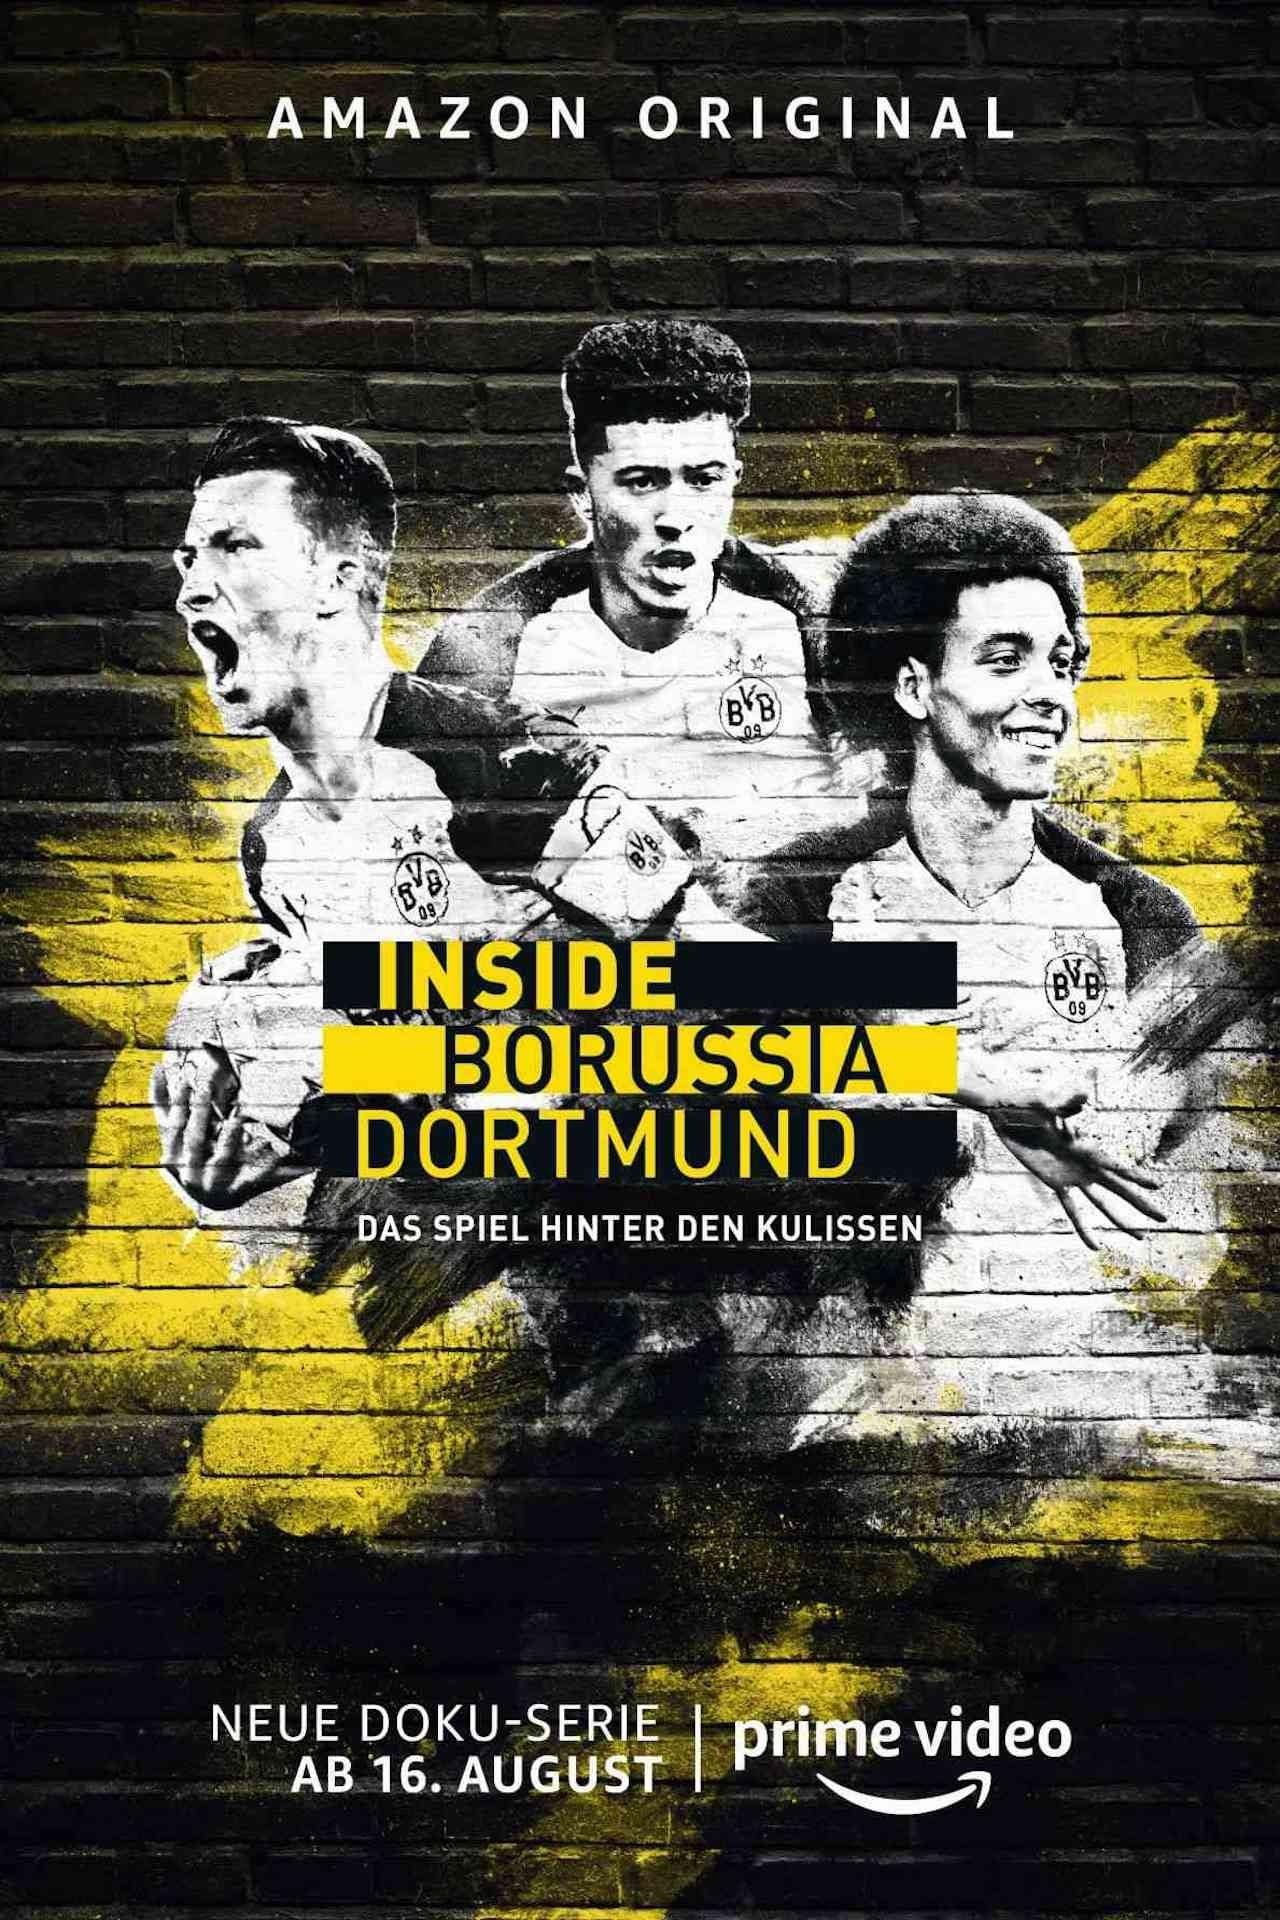 Inside Borussia Dortmund Season 1